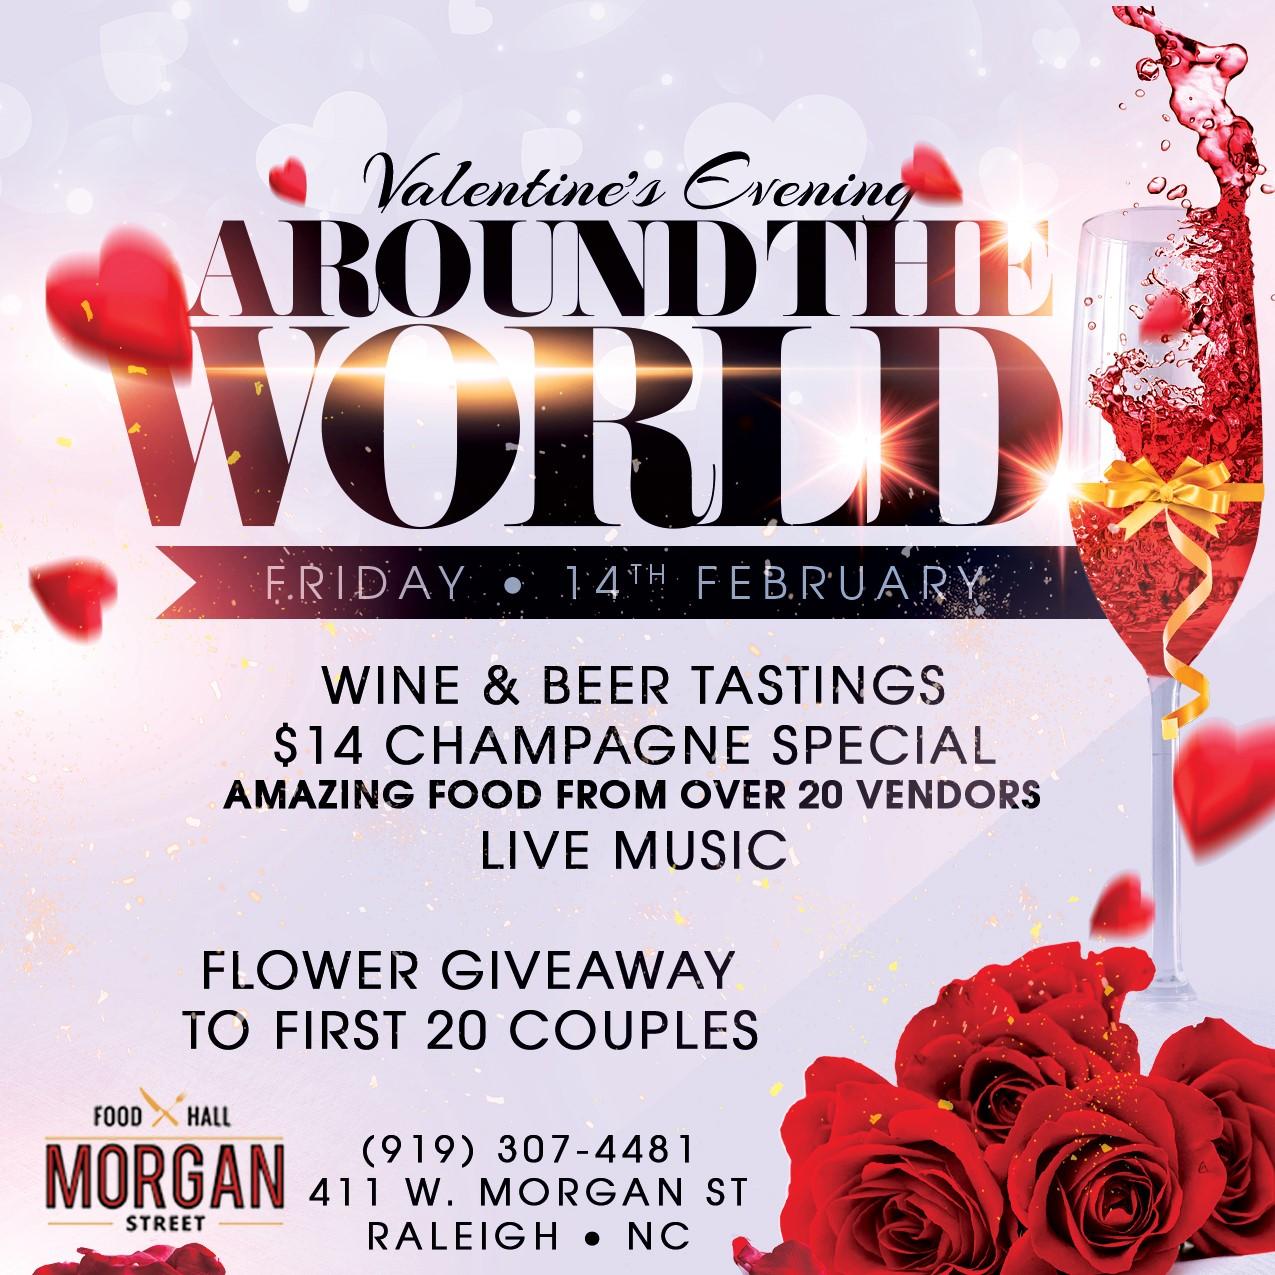 Around the World at Morgan Street Food Hall